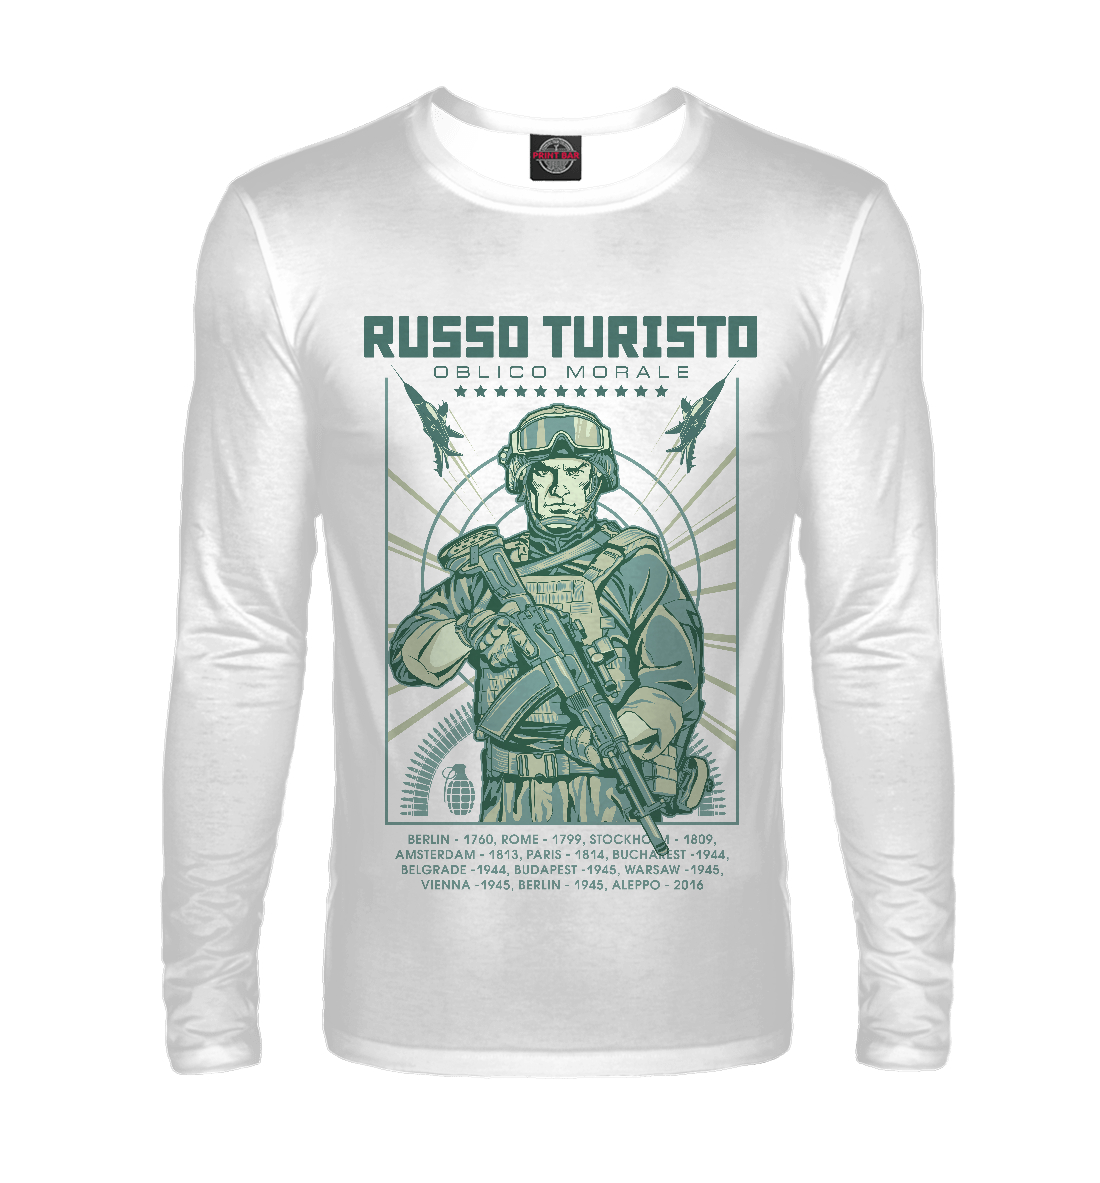 Лонгслив Руссо туристо (4680)